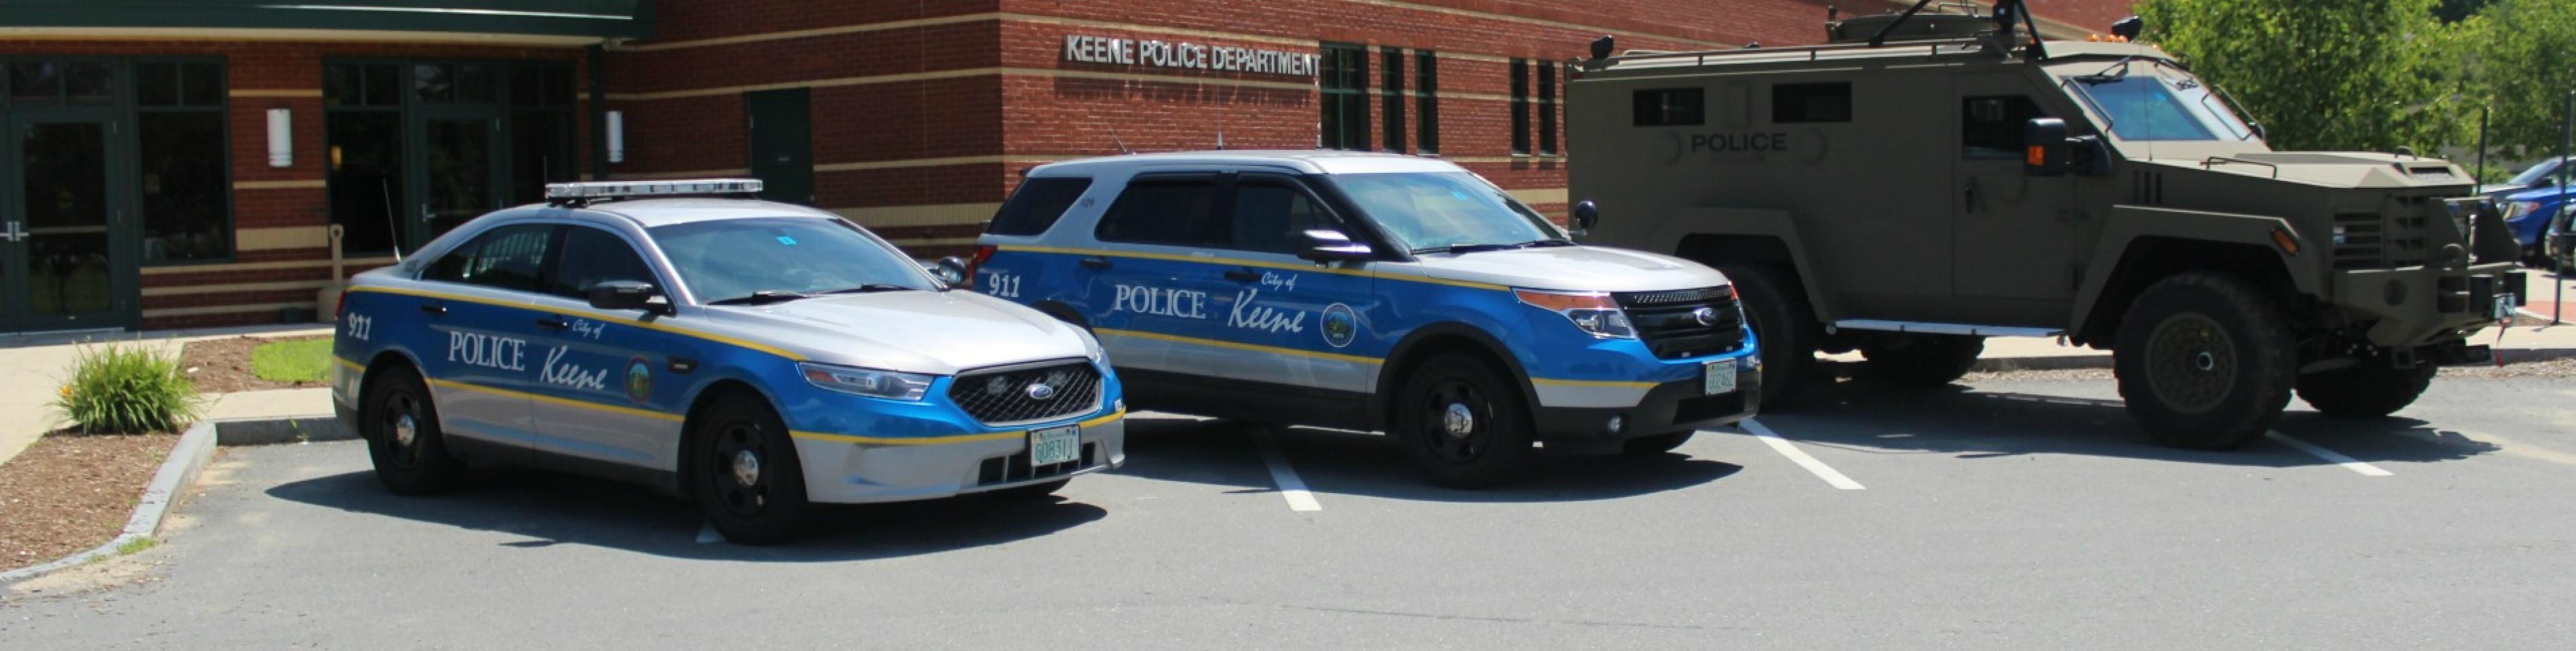 keene police vehicles